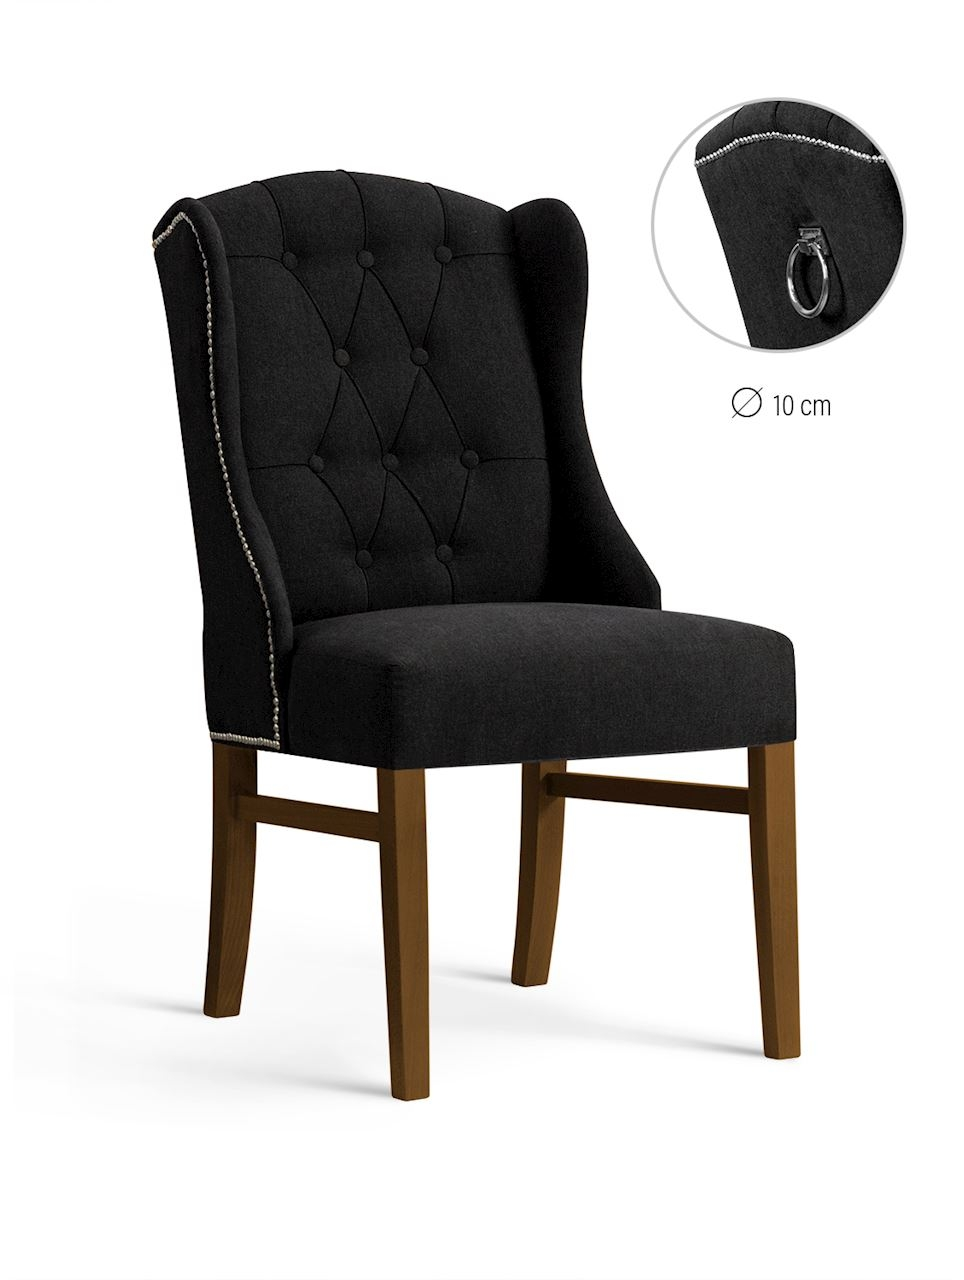 Scaun tapitat cu stofa, cu picioare din lemn Royal Black / Walnut, l55xA74xH105 cm